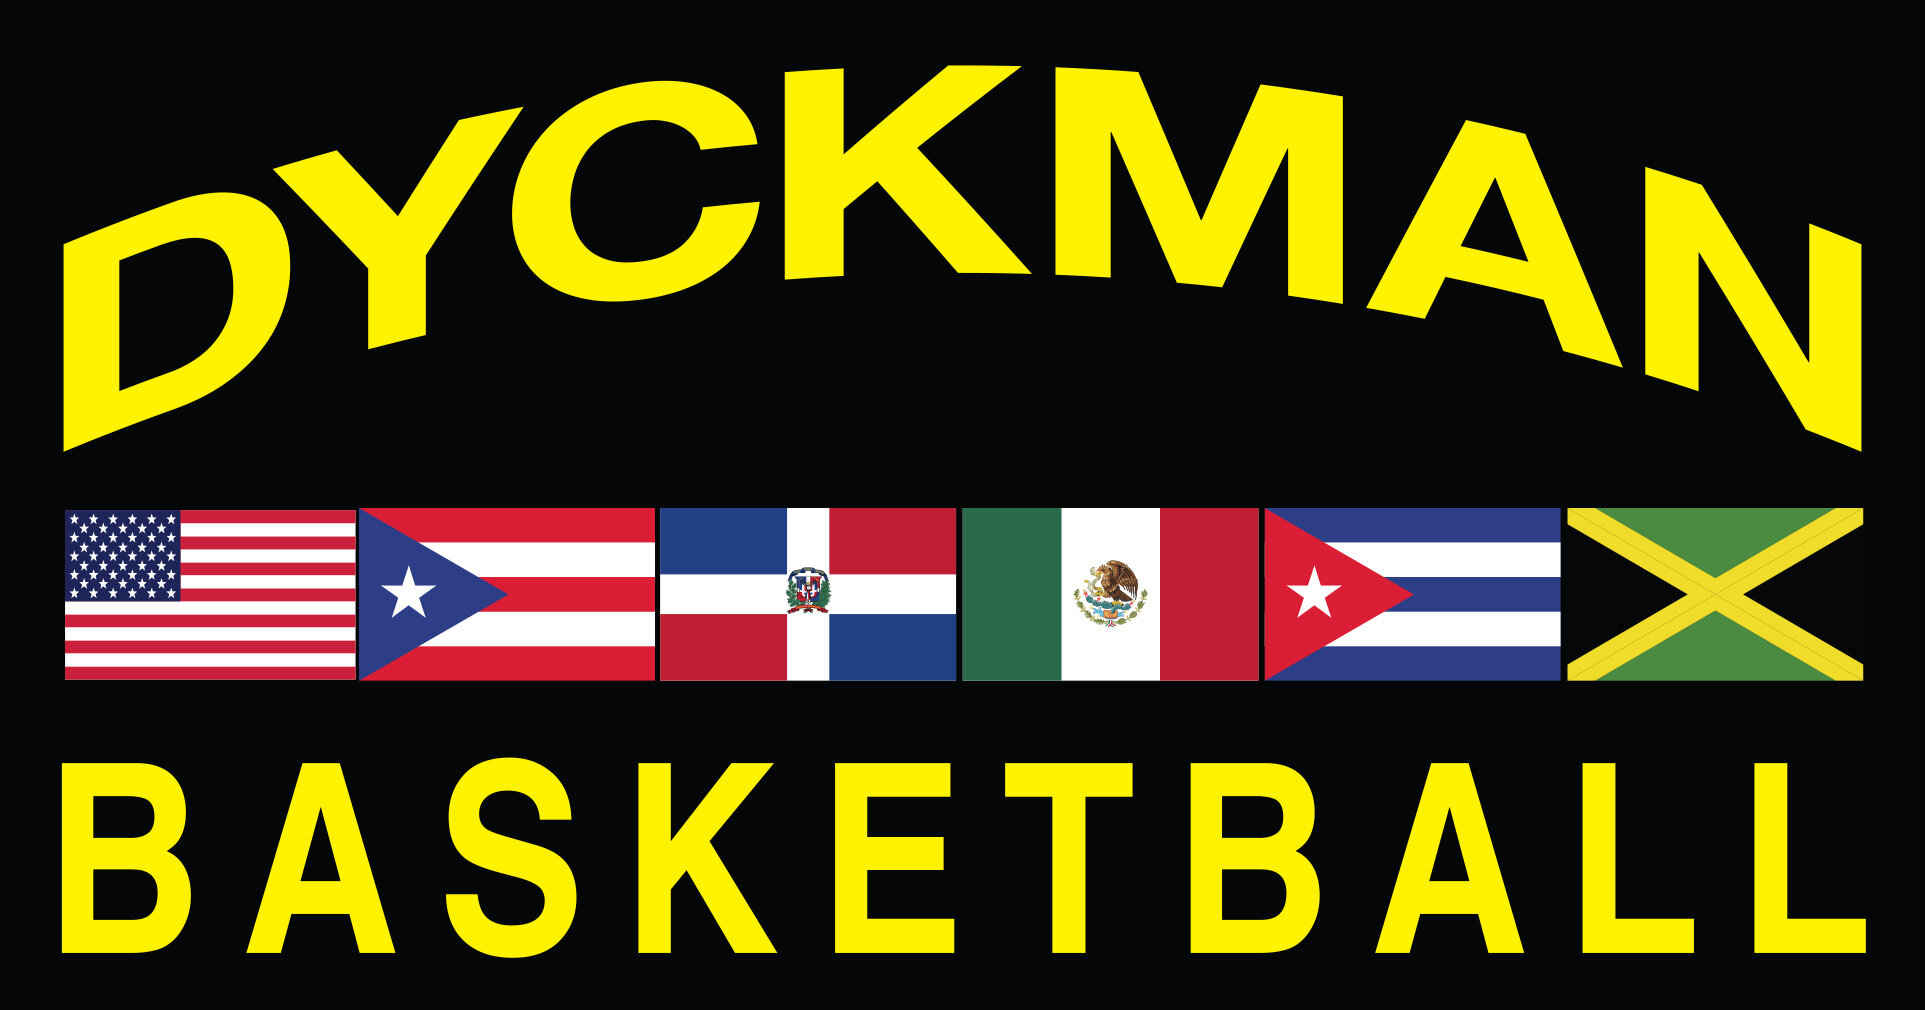 BASKETBALL DYCKMAN.jpg